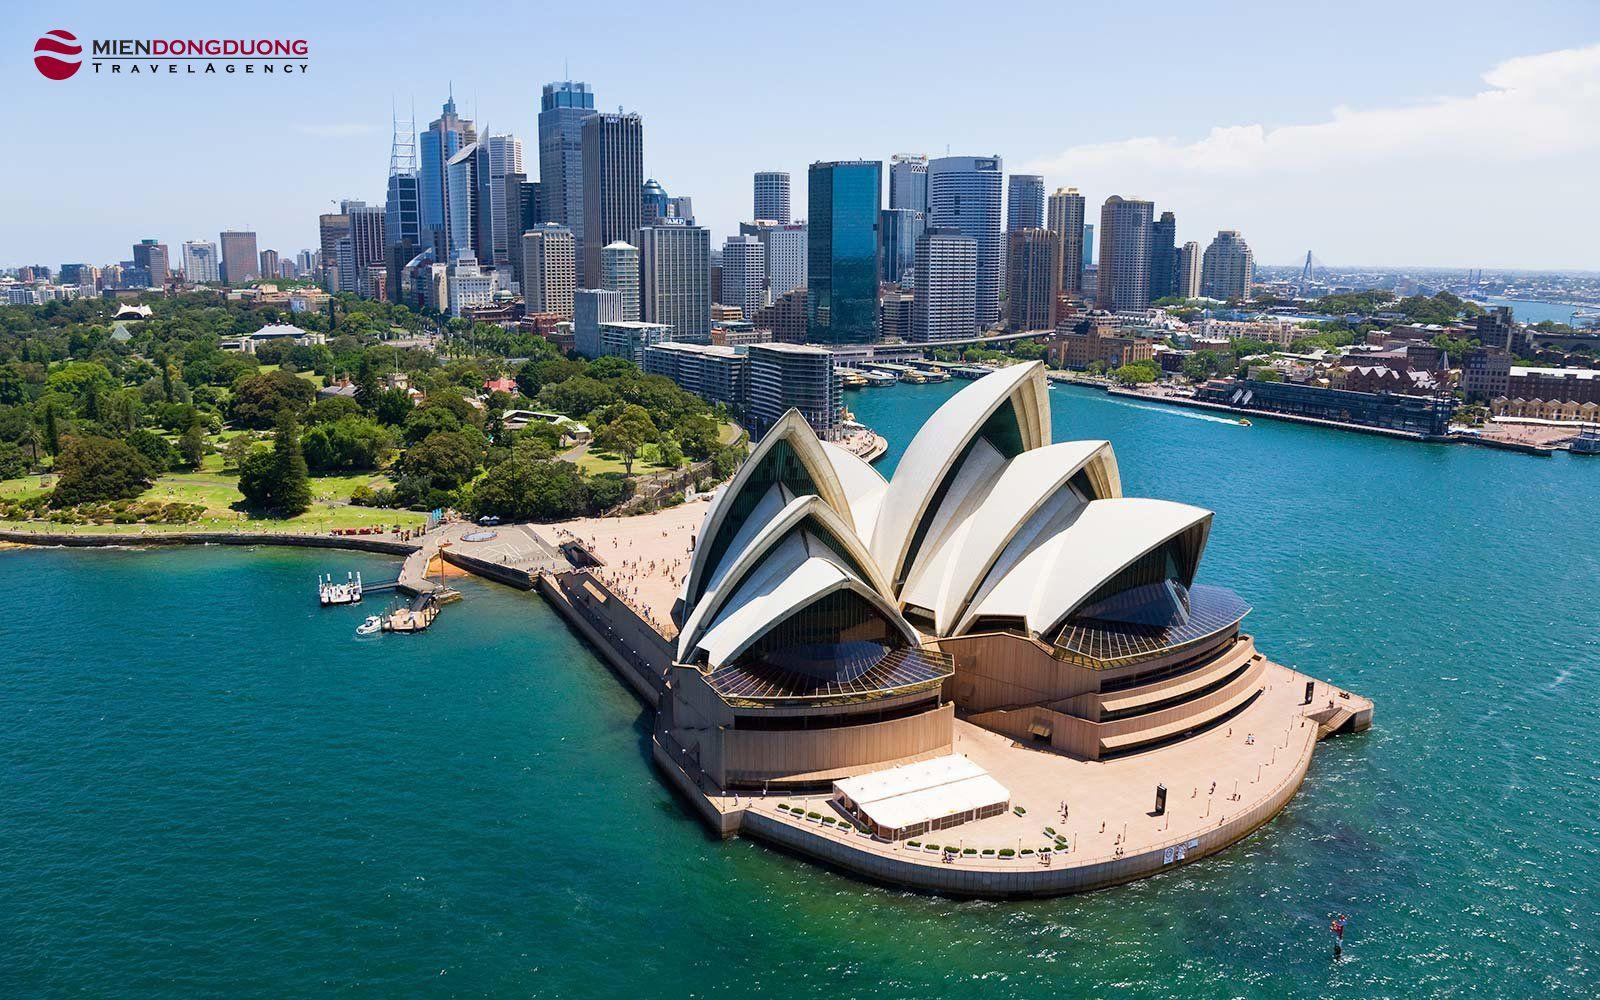 HÀ NỘI//HCM - MELBOURNE - CANBERRA - SYDNEY - HÀ NỘI//HCM